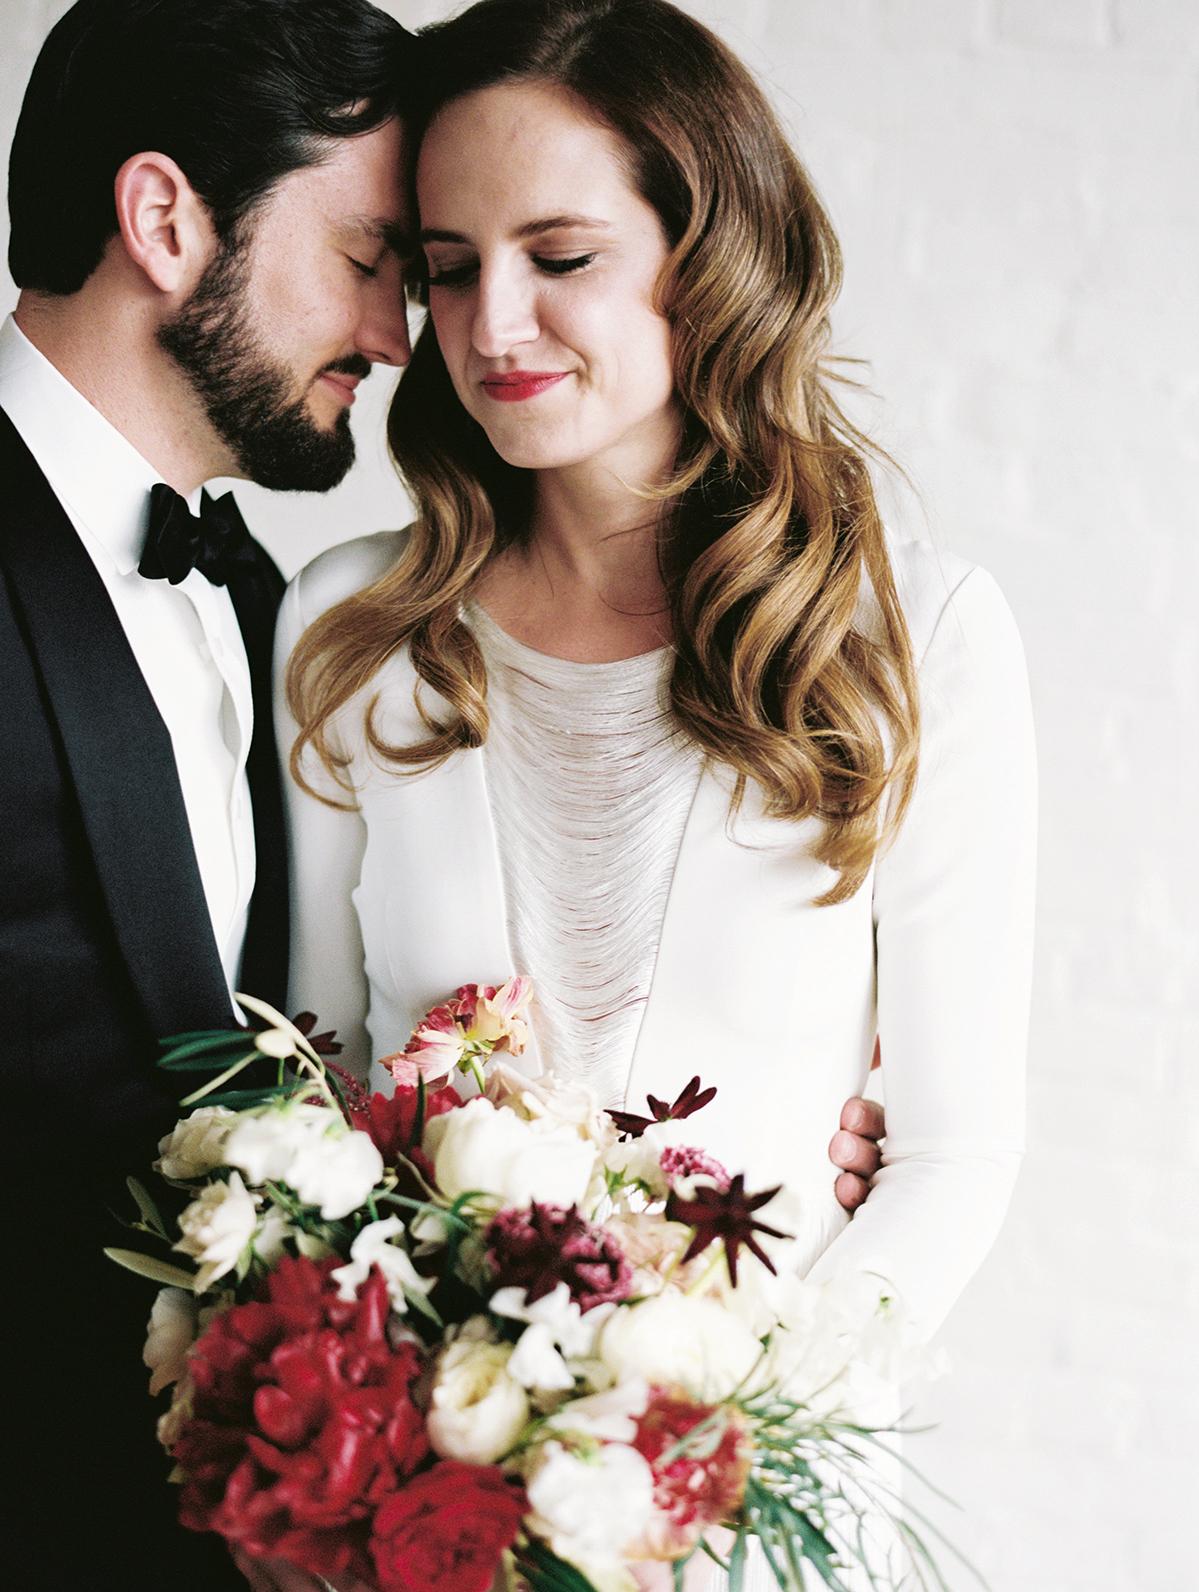 joanna jay wedding couple embrace